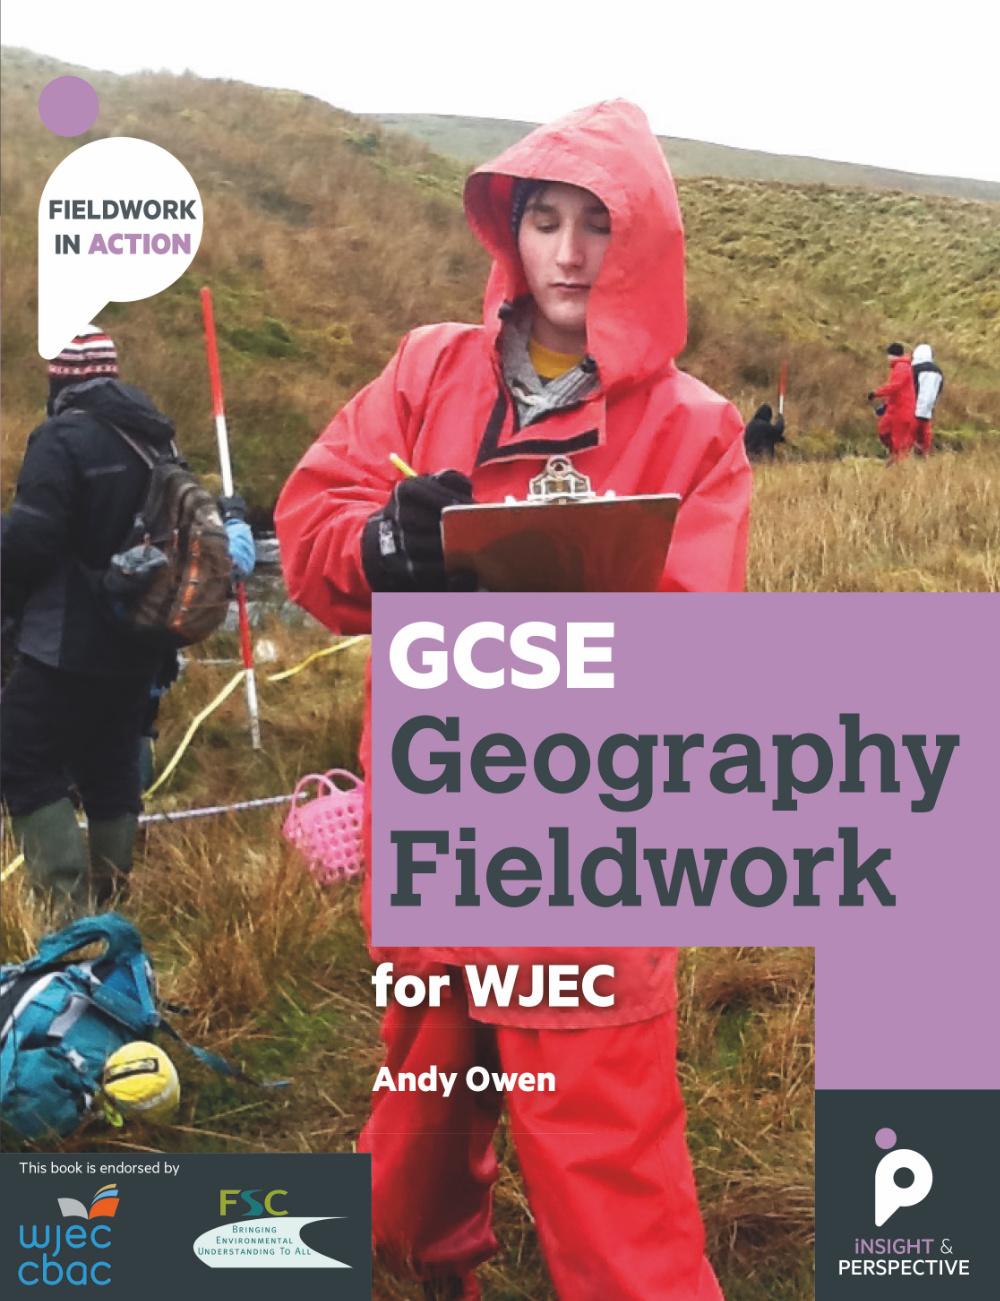 GCSE-Geography-Fieldwork-for-WJEC.jpg